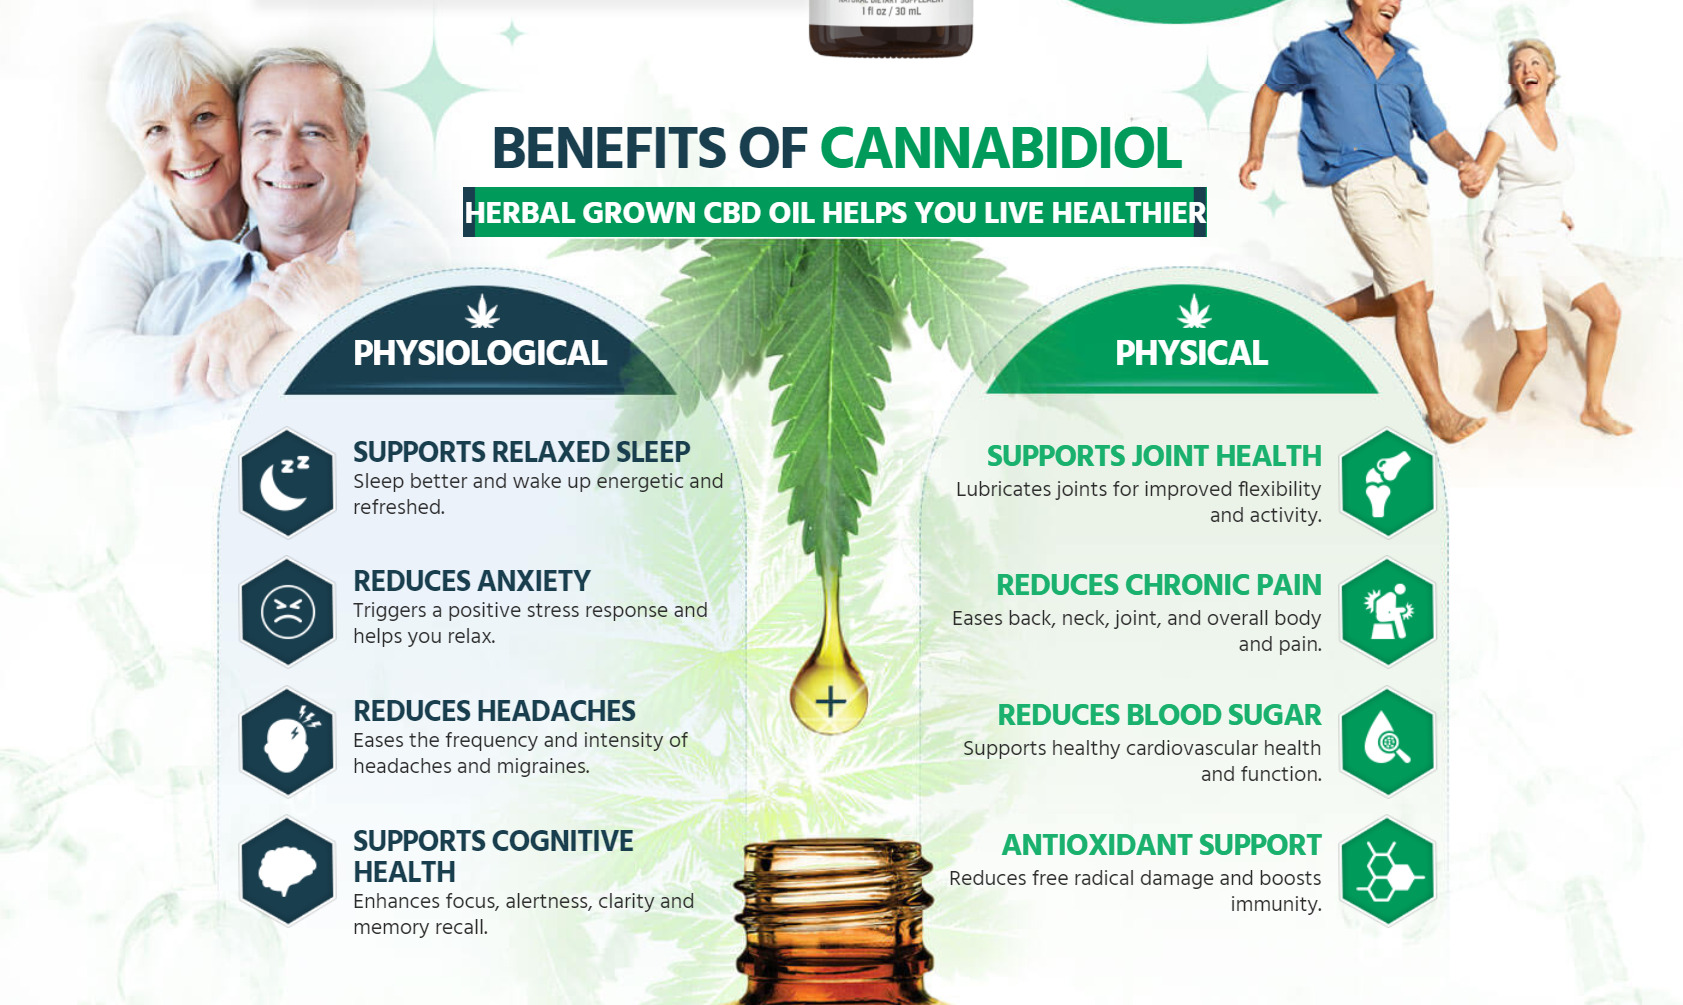 herbal grown cbd oil benefits